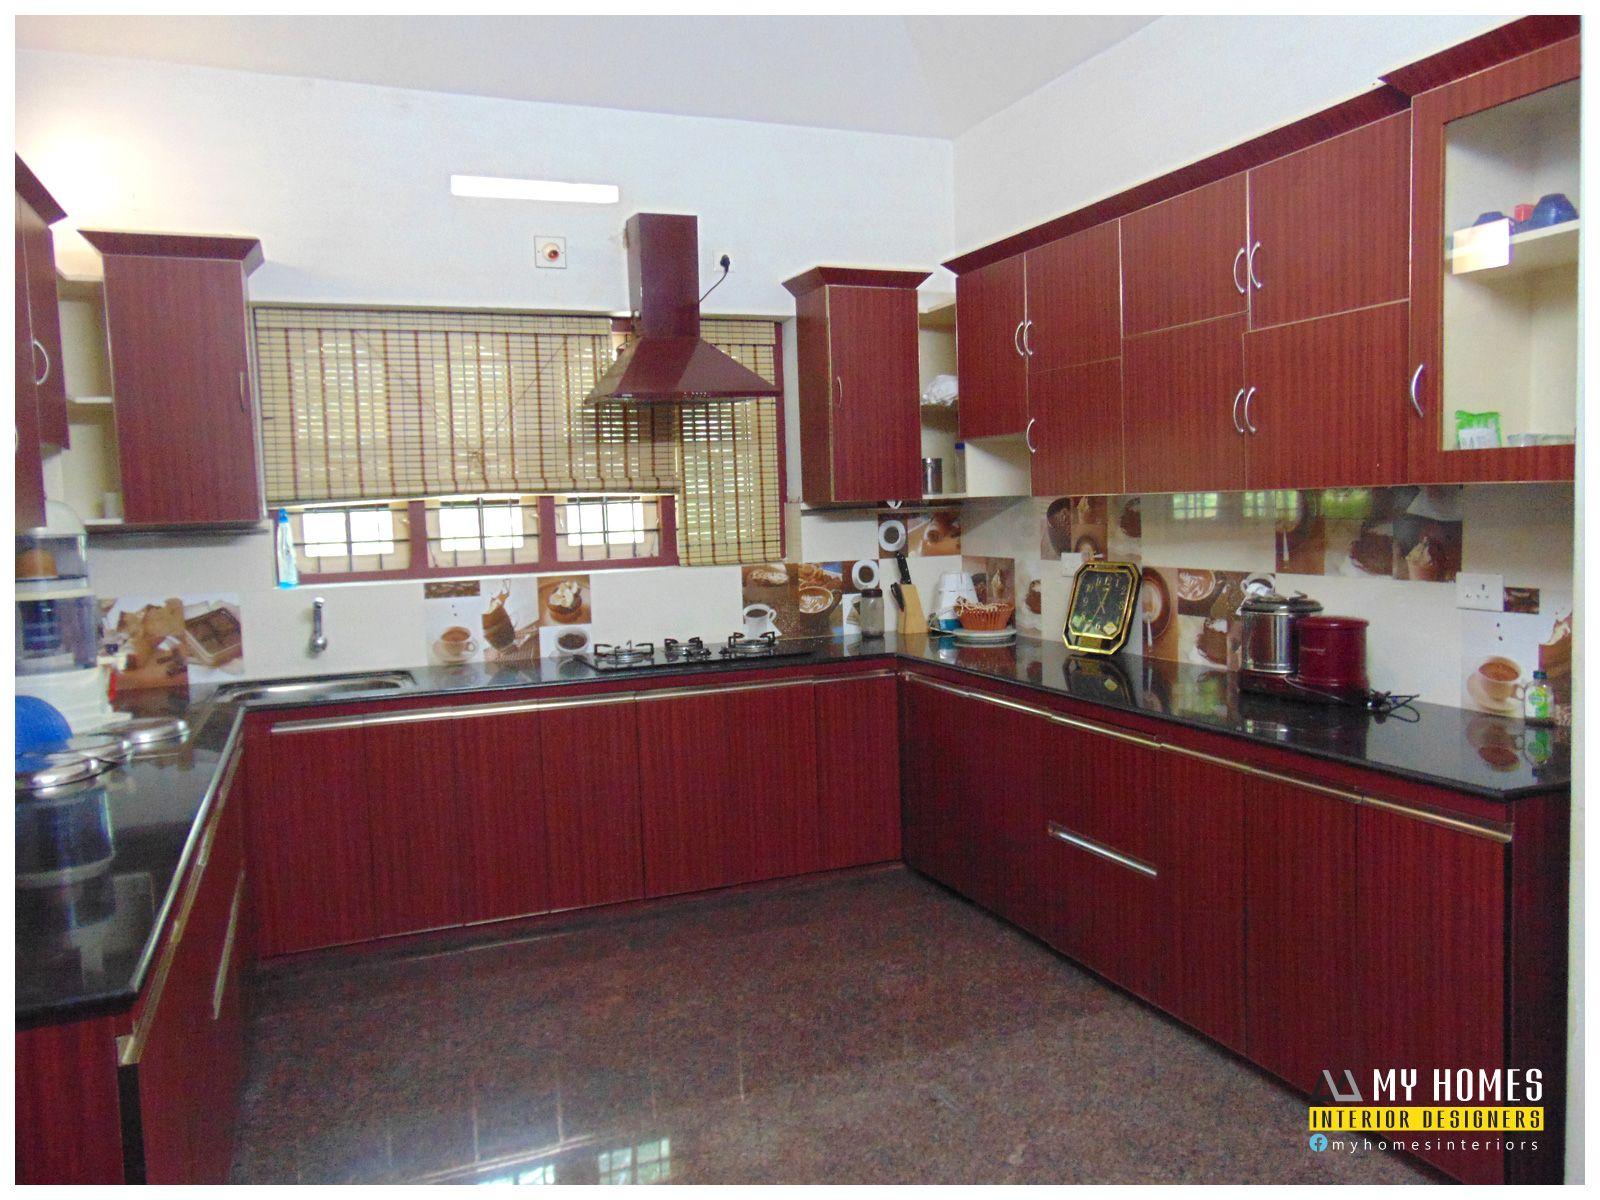 Bathroom Interior Design Kerala in 2020   Model kitchen ...